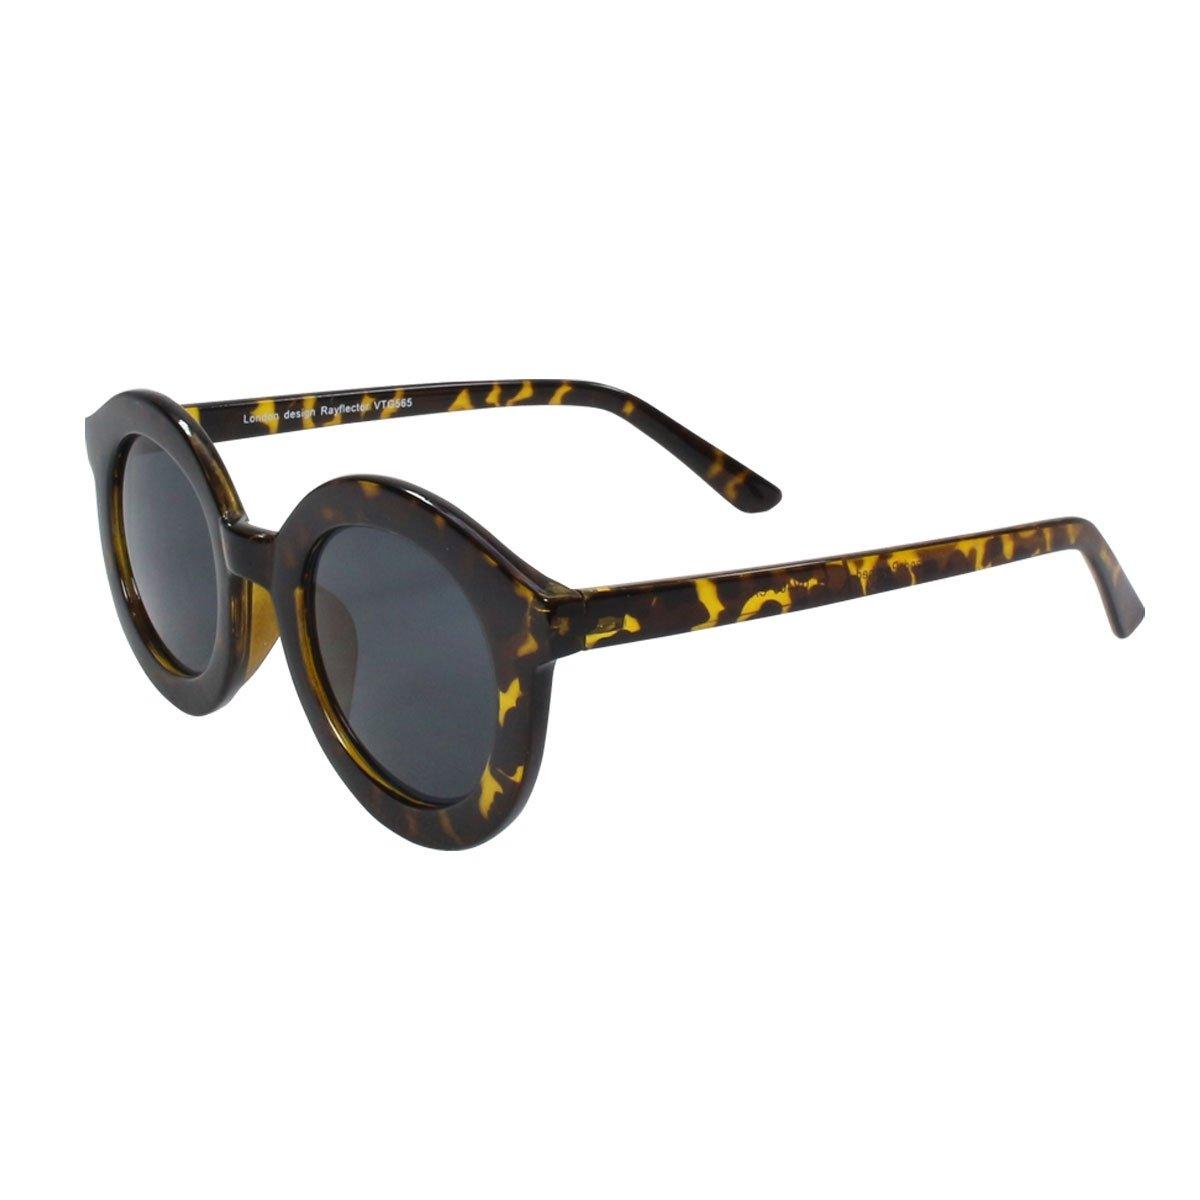 Óculos Ray Flector Sherlock Holmes VTG565CO - Compre Agora   Netshoes 6dddf37149